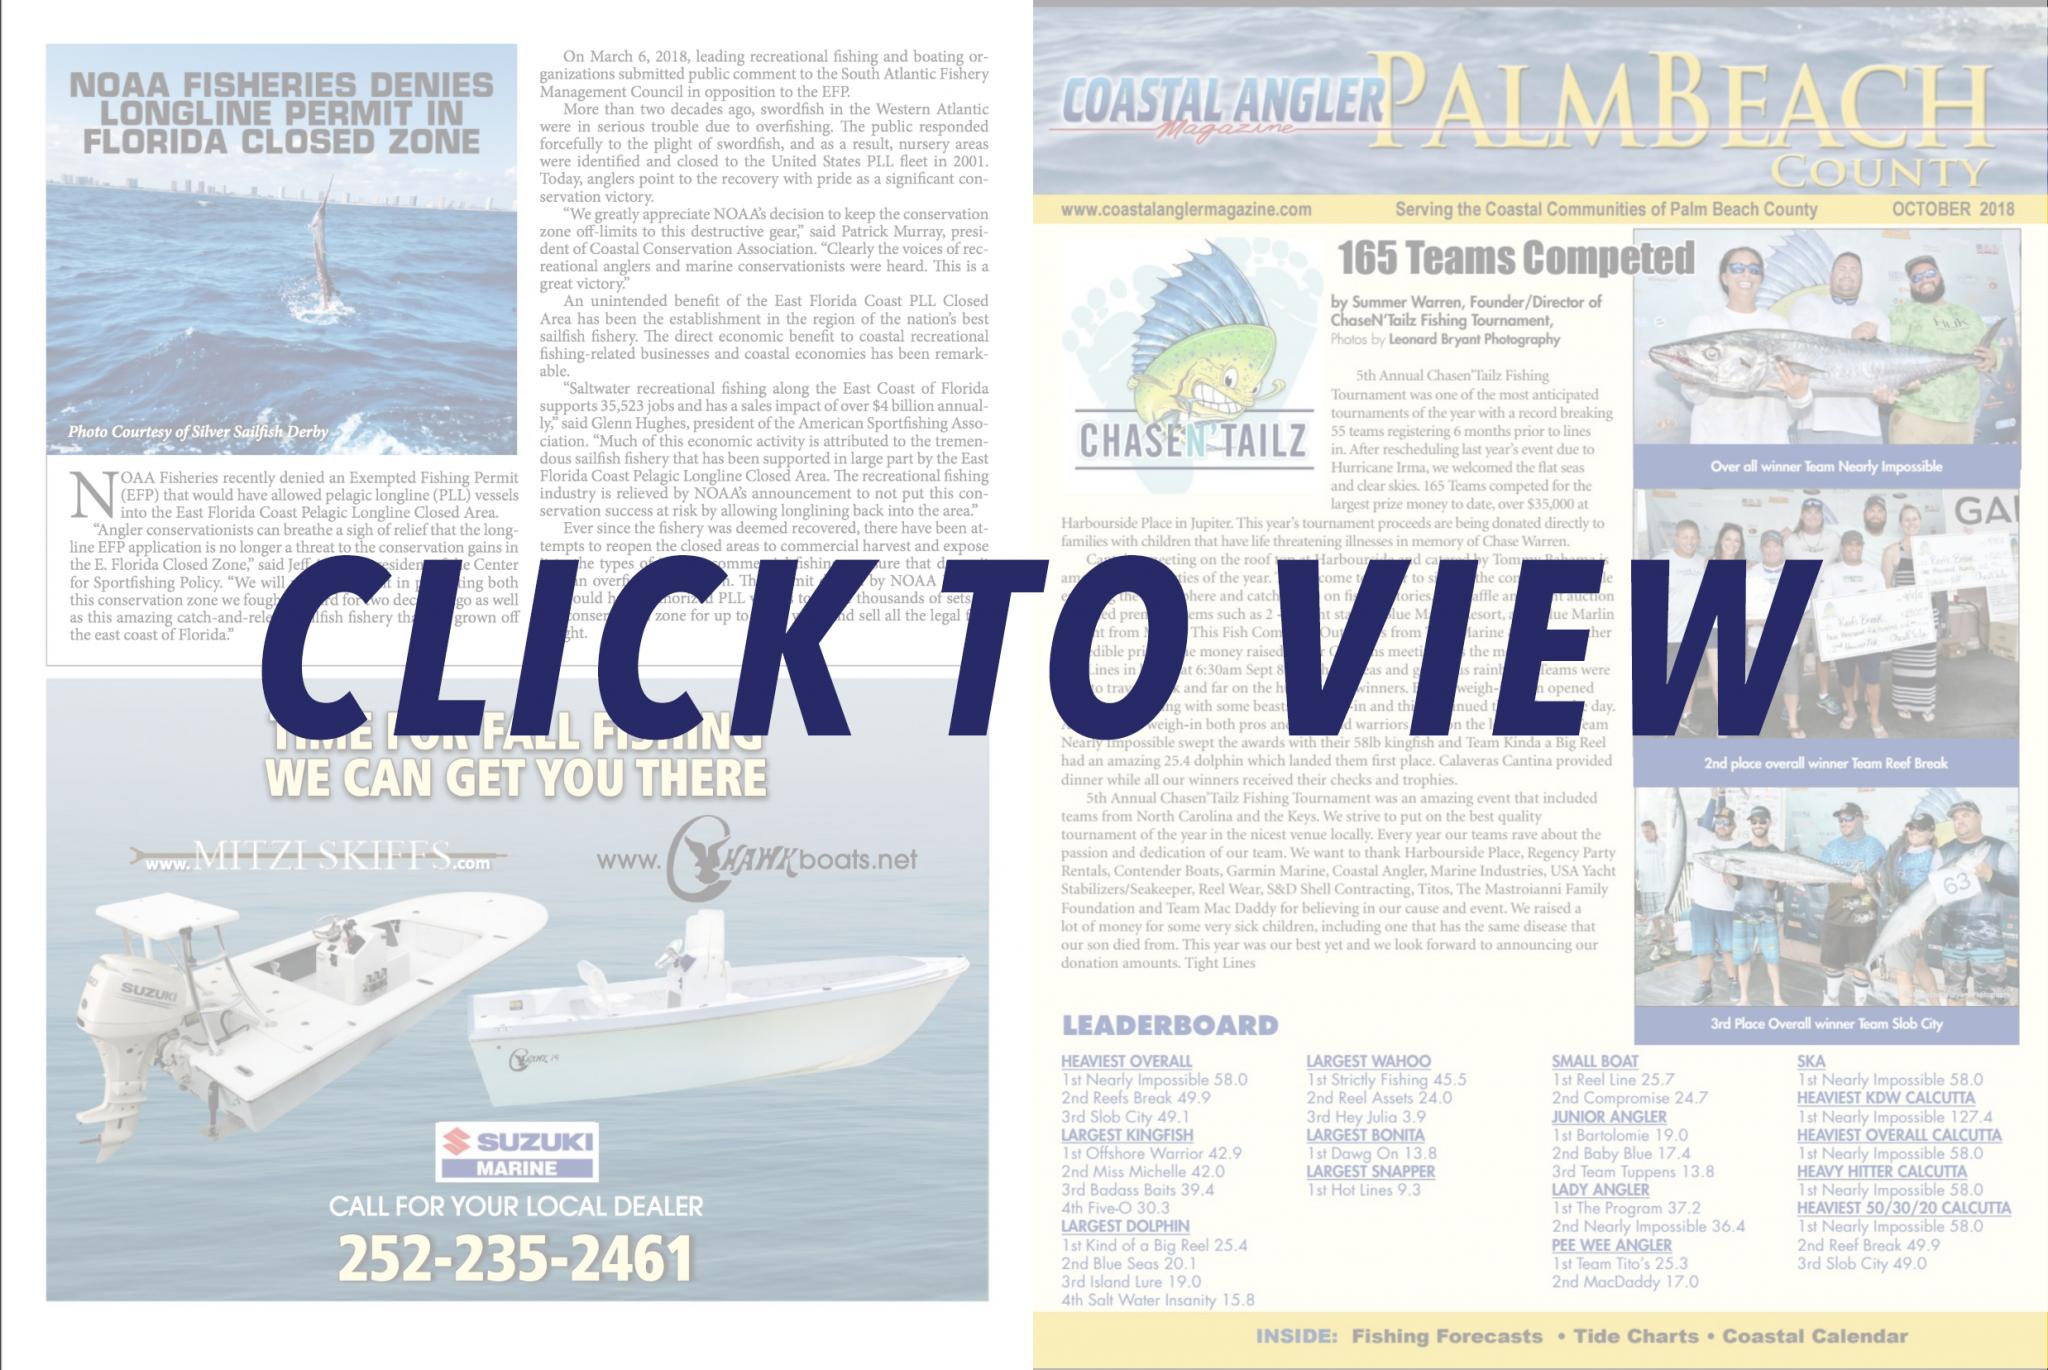 Coastal Angler Magazine Palm Beach Edition Coastal Angler The